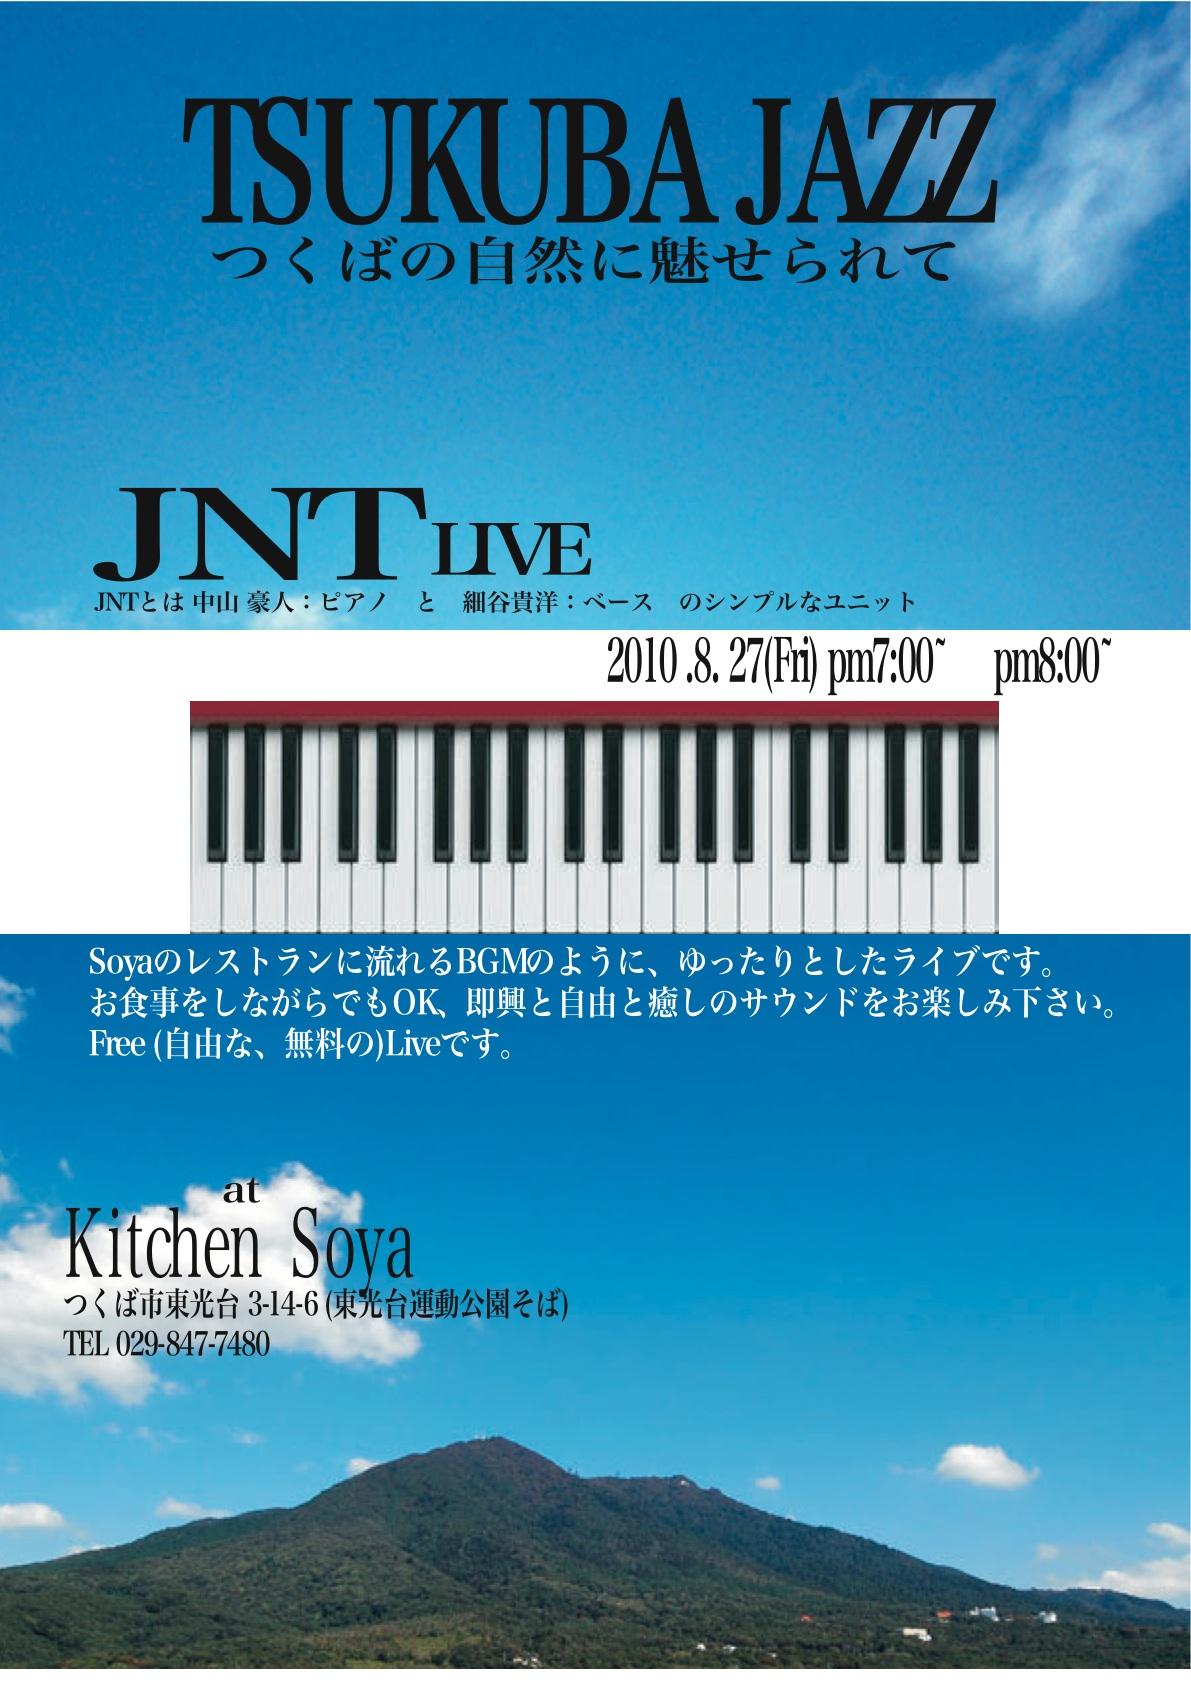 JNT(中山豪人 : ピアノ,  細谷貴洋 : ベース) LIVE